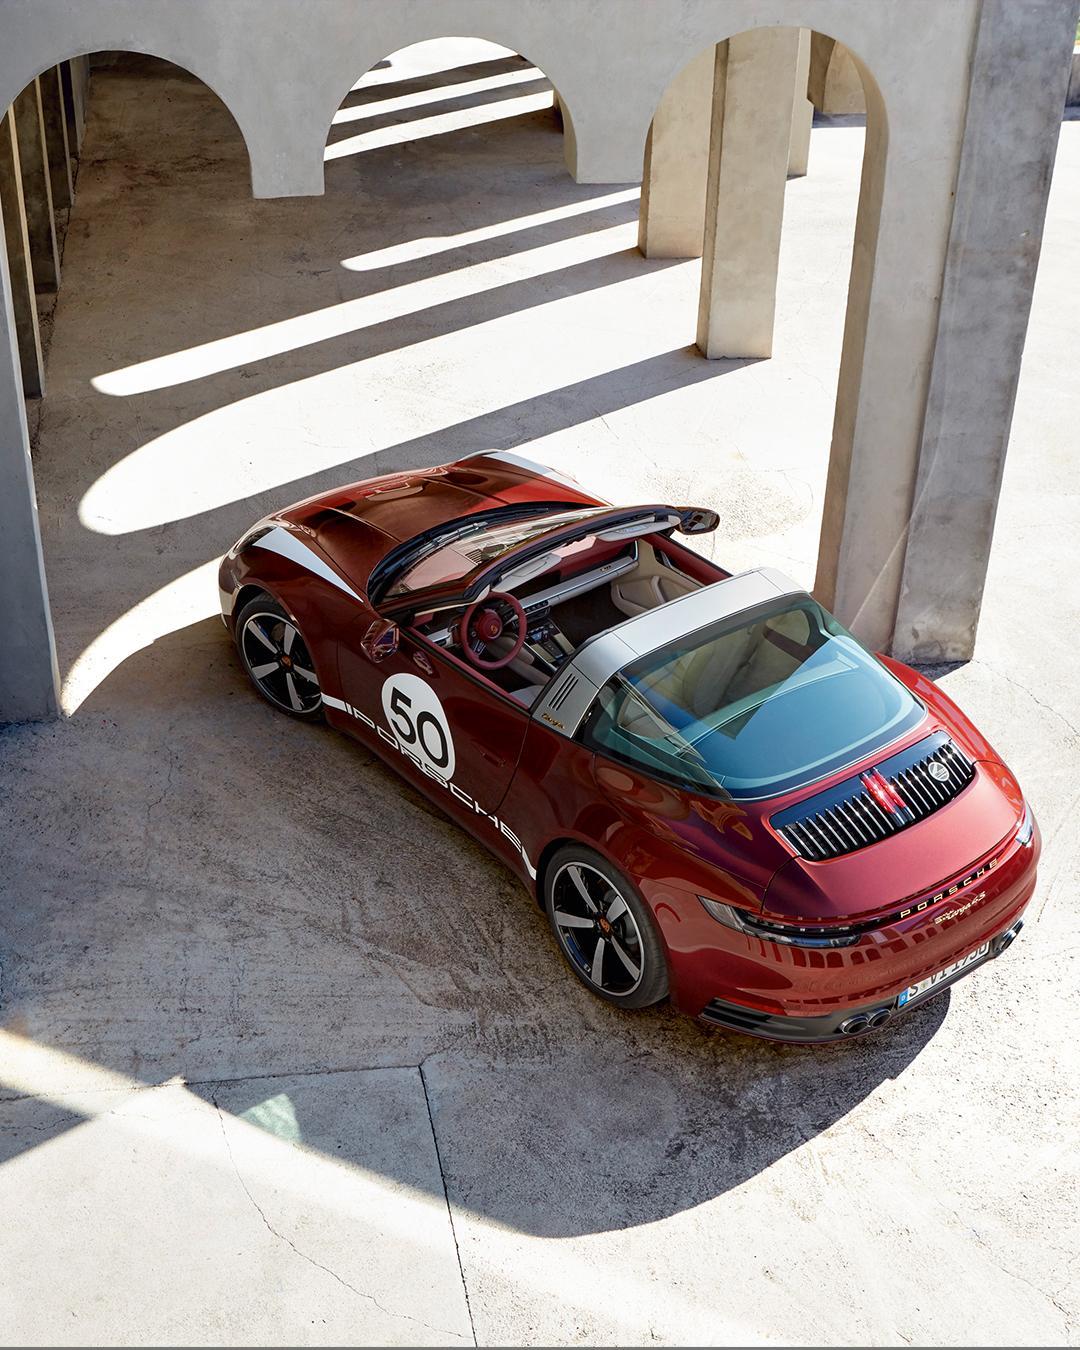 Porsche-911-Targa-4S-Heritage-Design-Edition-40-2